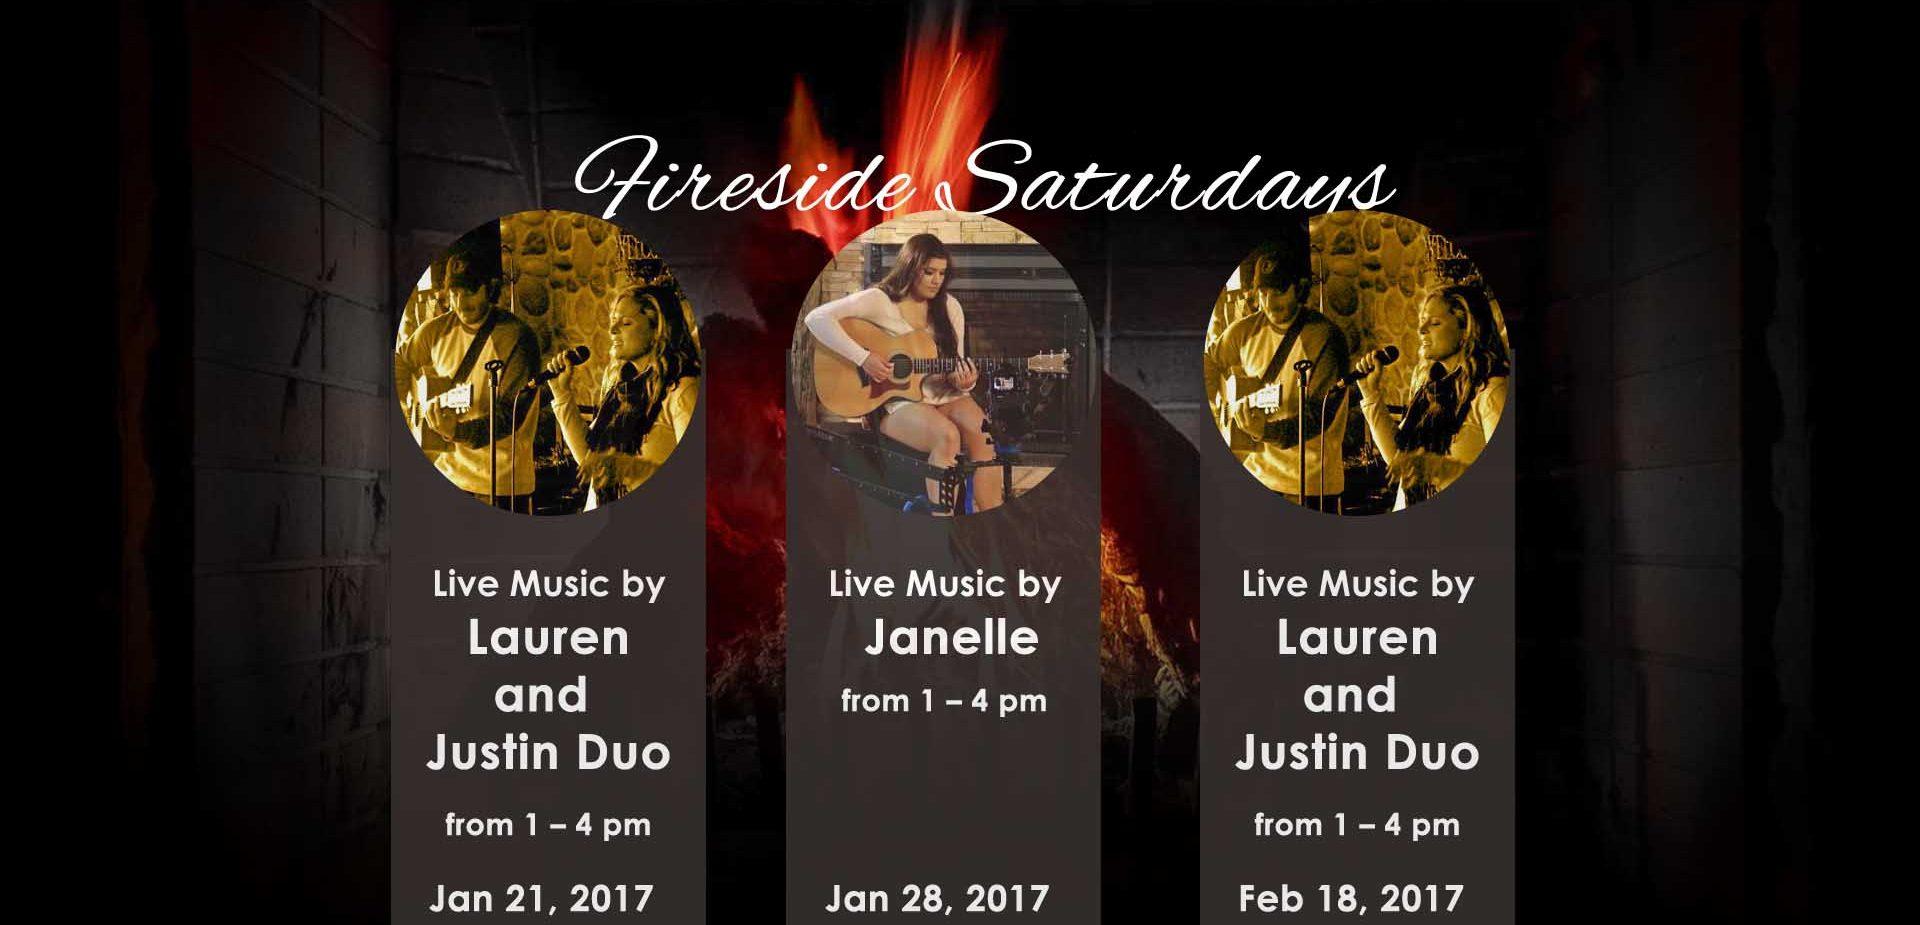 Fireside Saturday Weekend Events